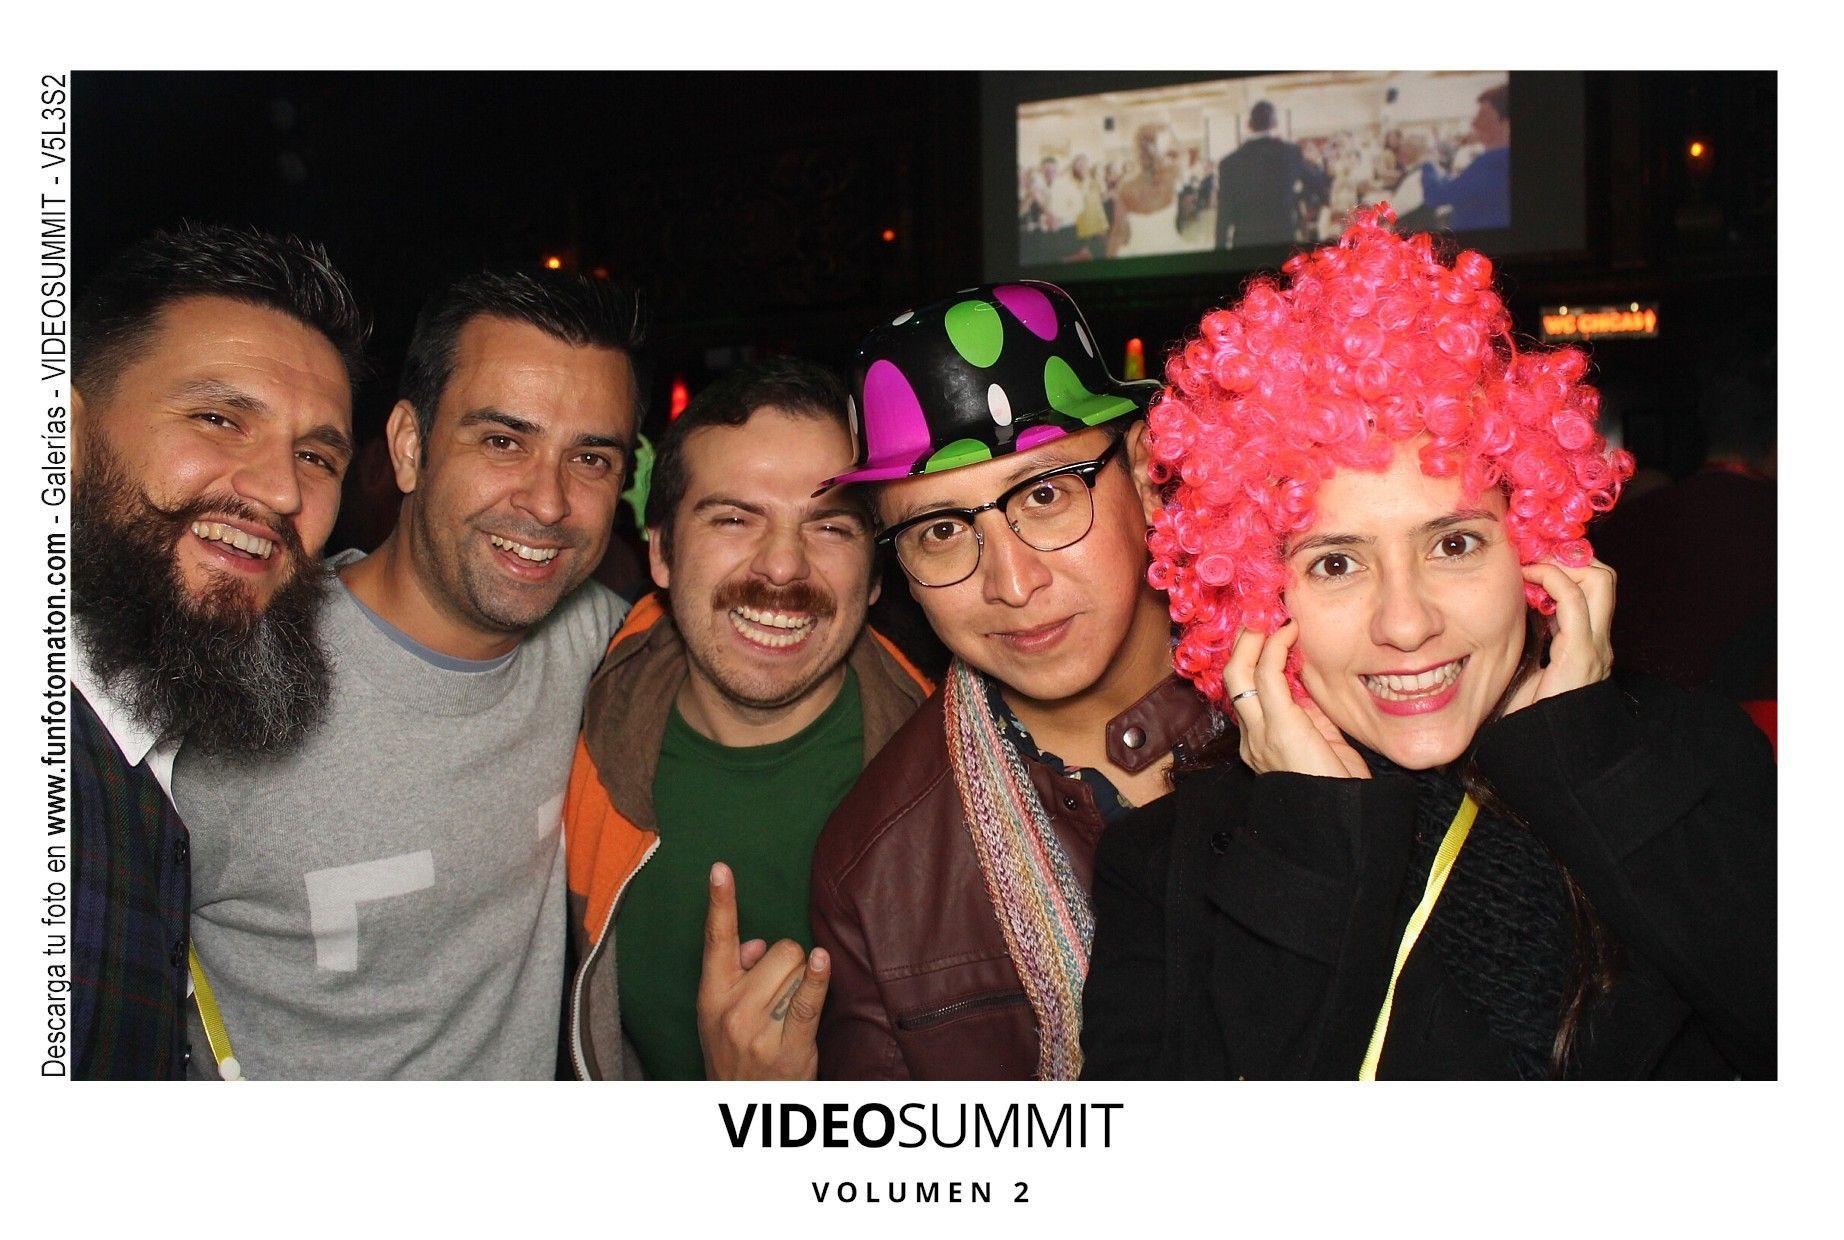 videosummit-vol2-club-party-024